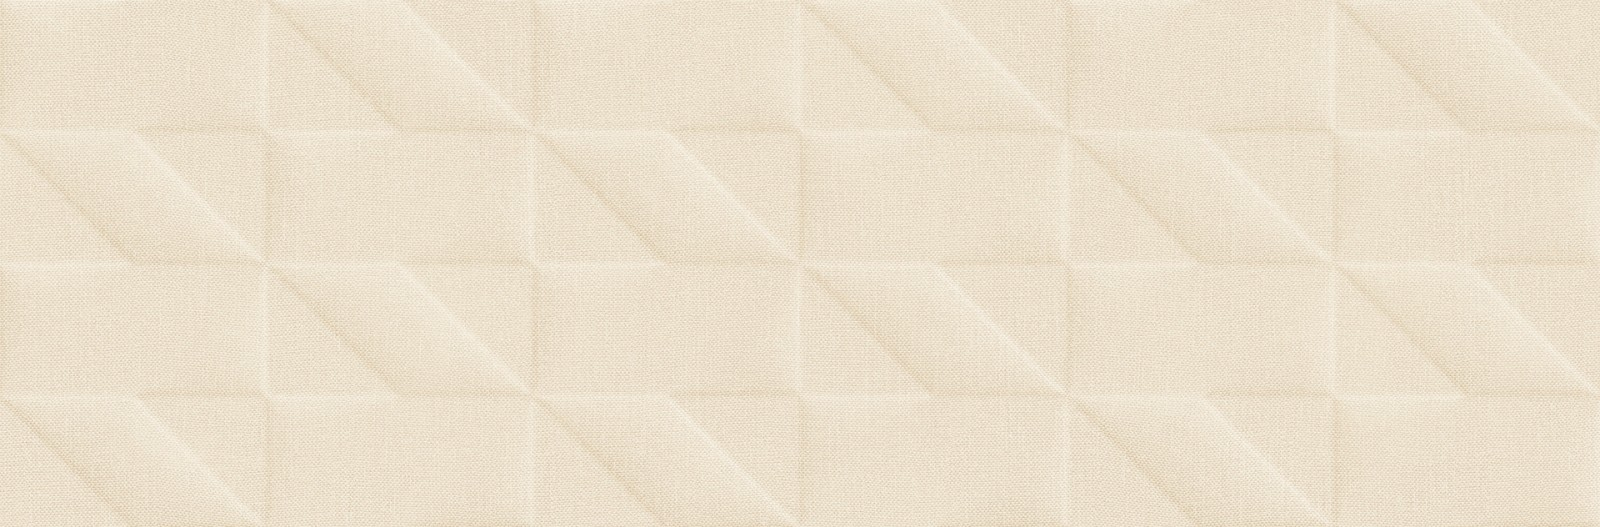 Стенни плочки Outfit Ivory Tetris 3D 25x76